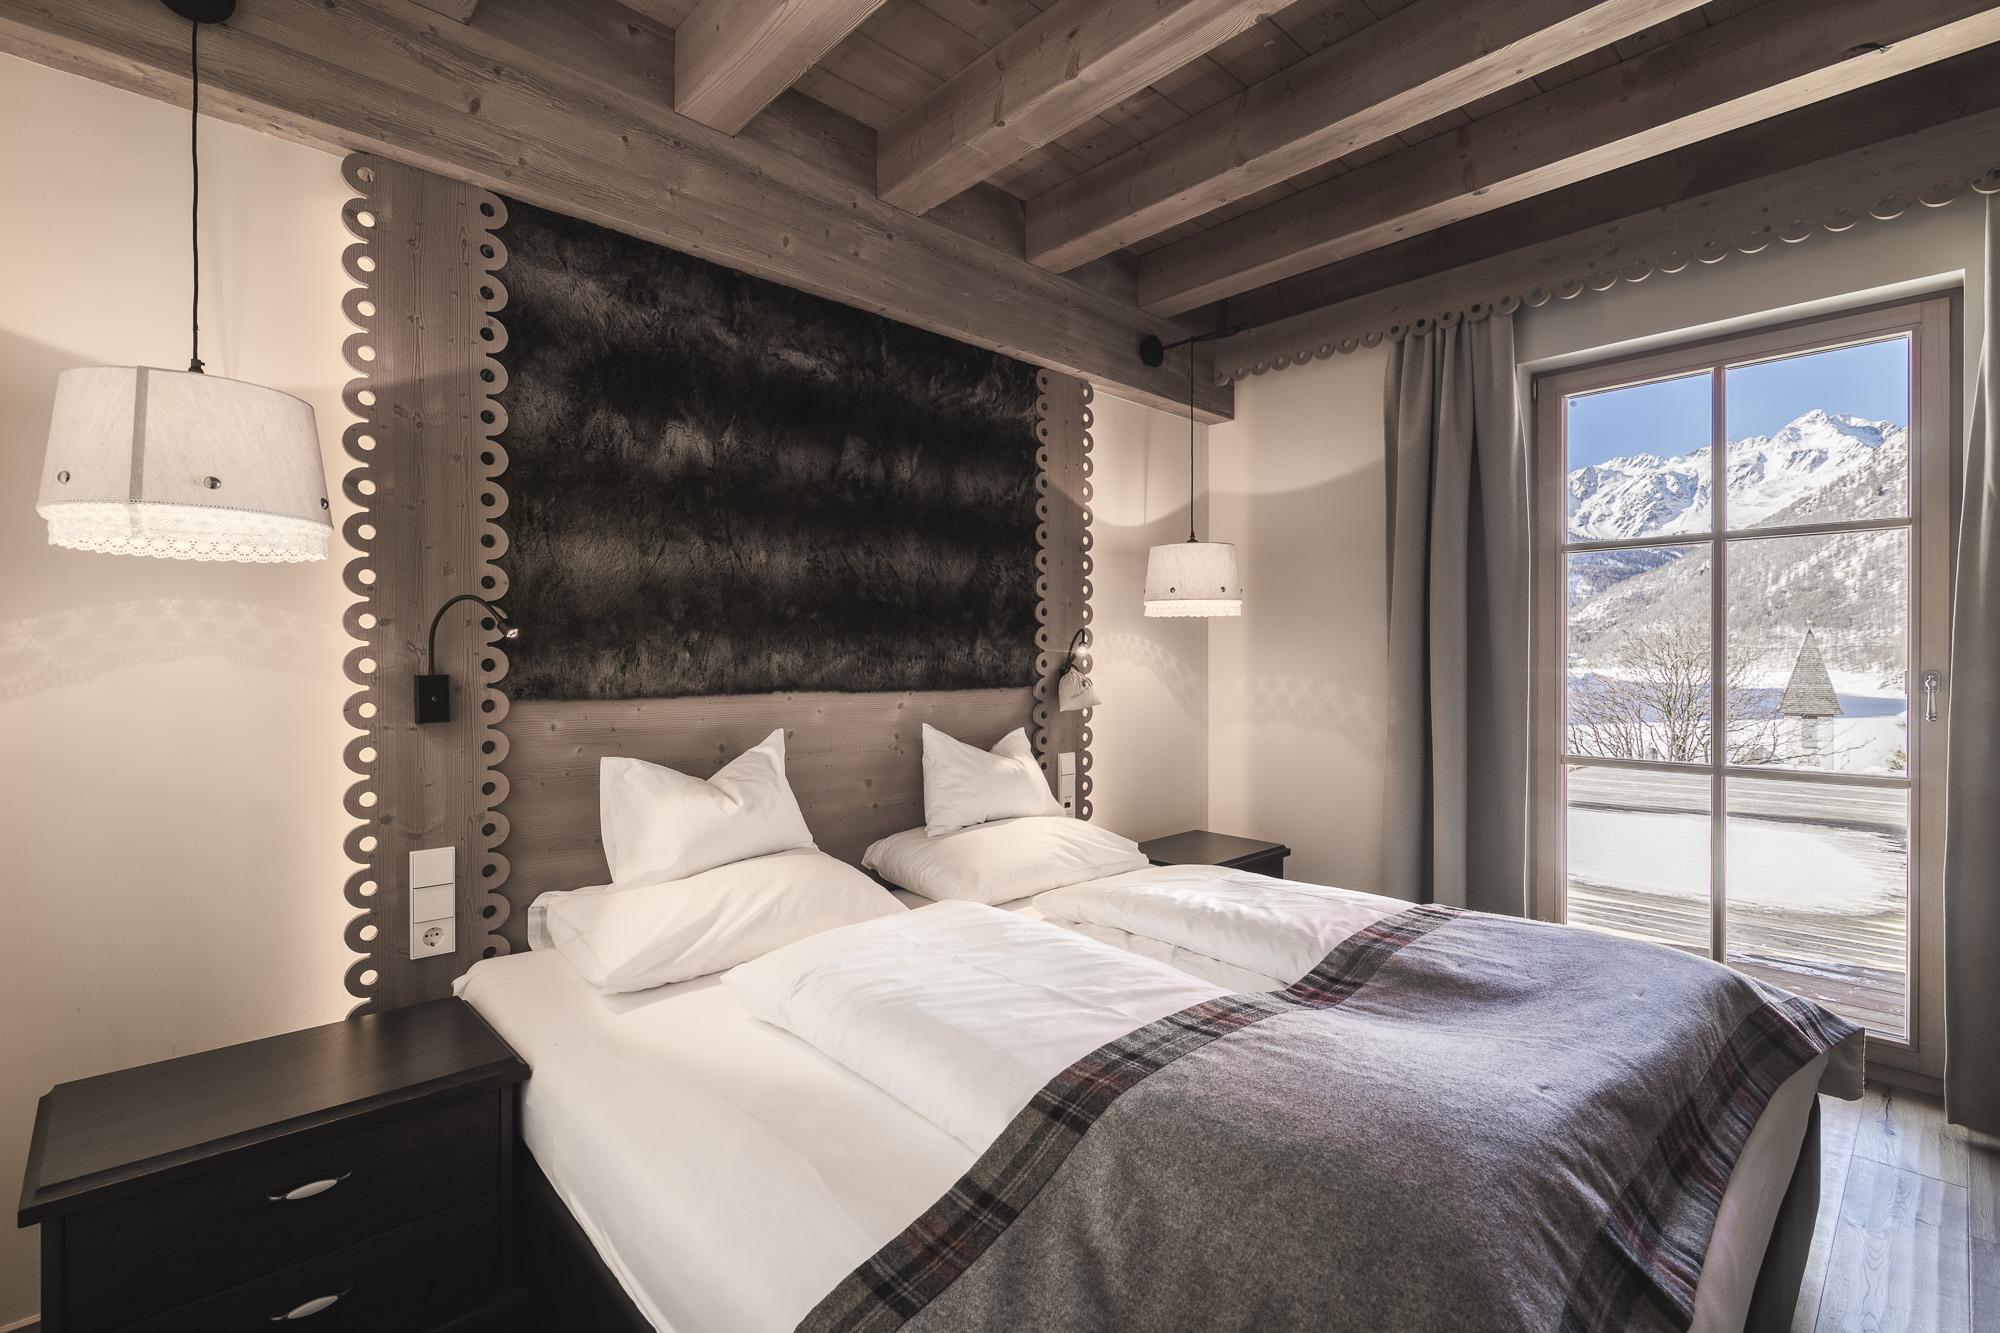 Hotel & Chalets Edelweiss (6)